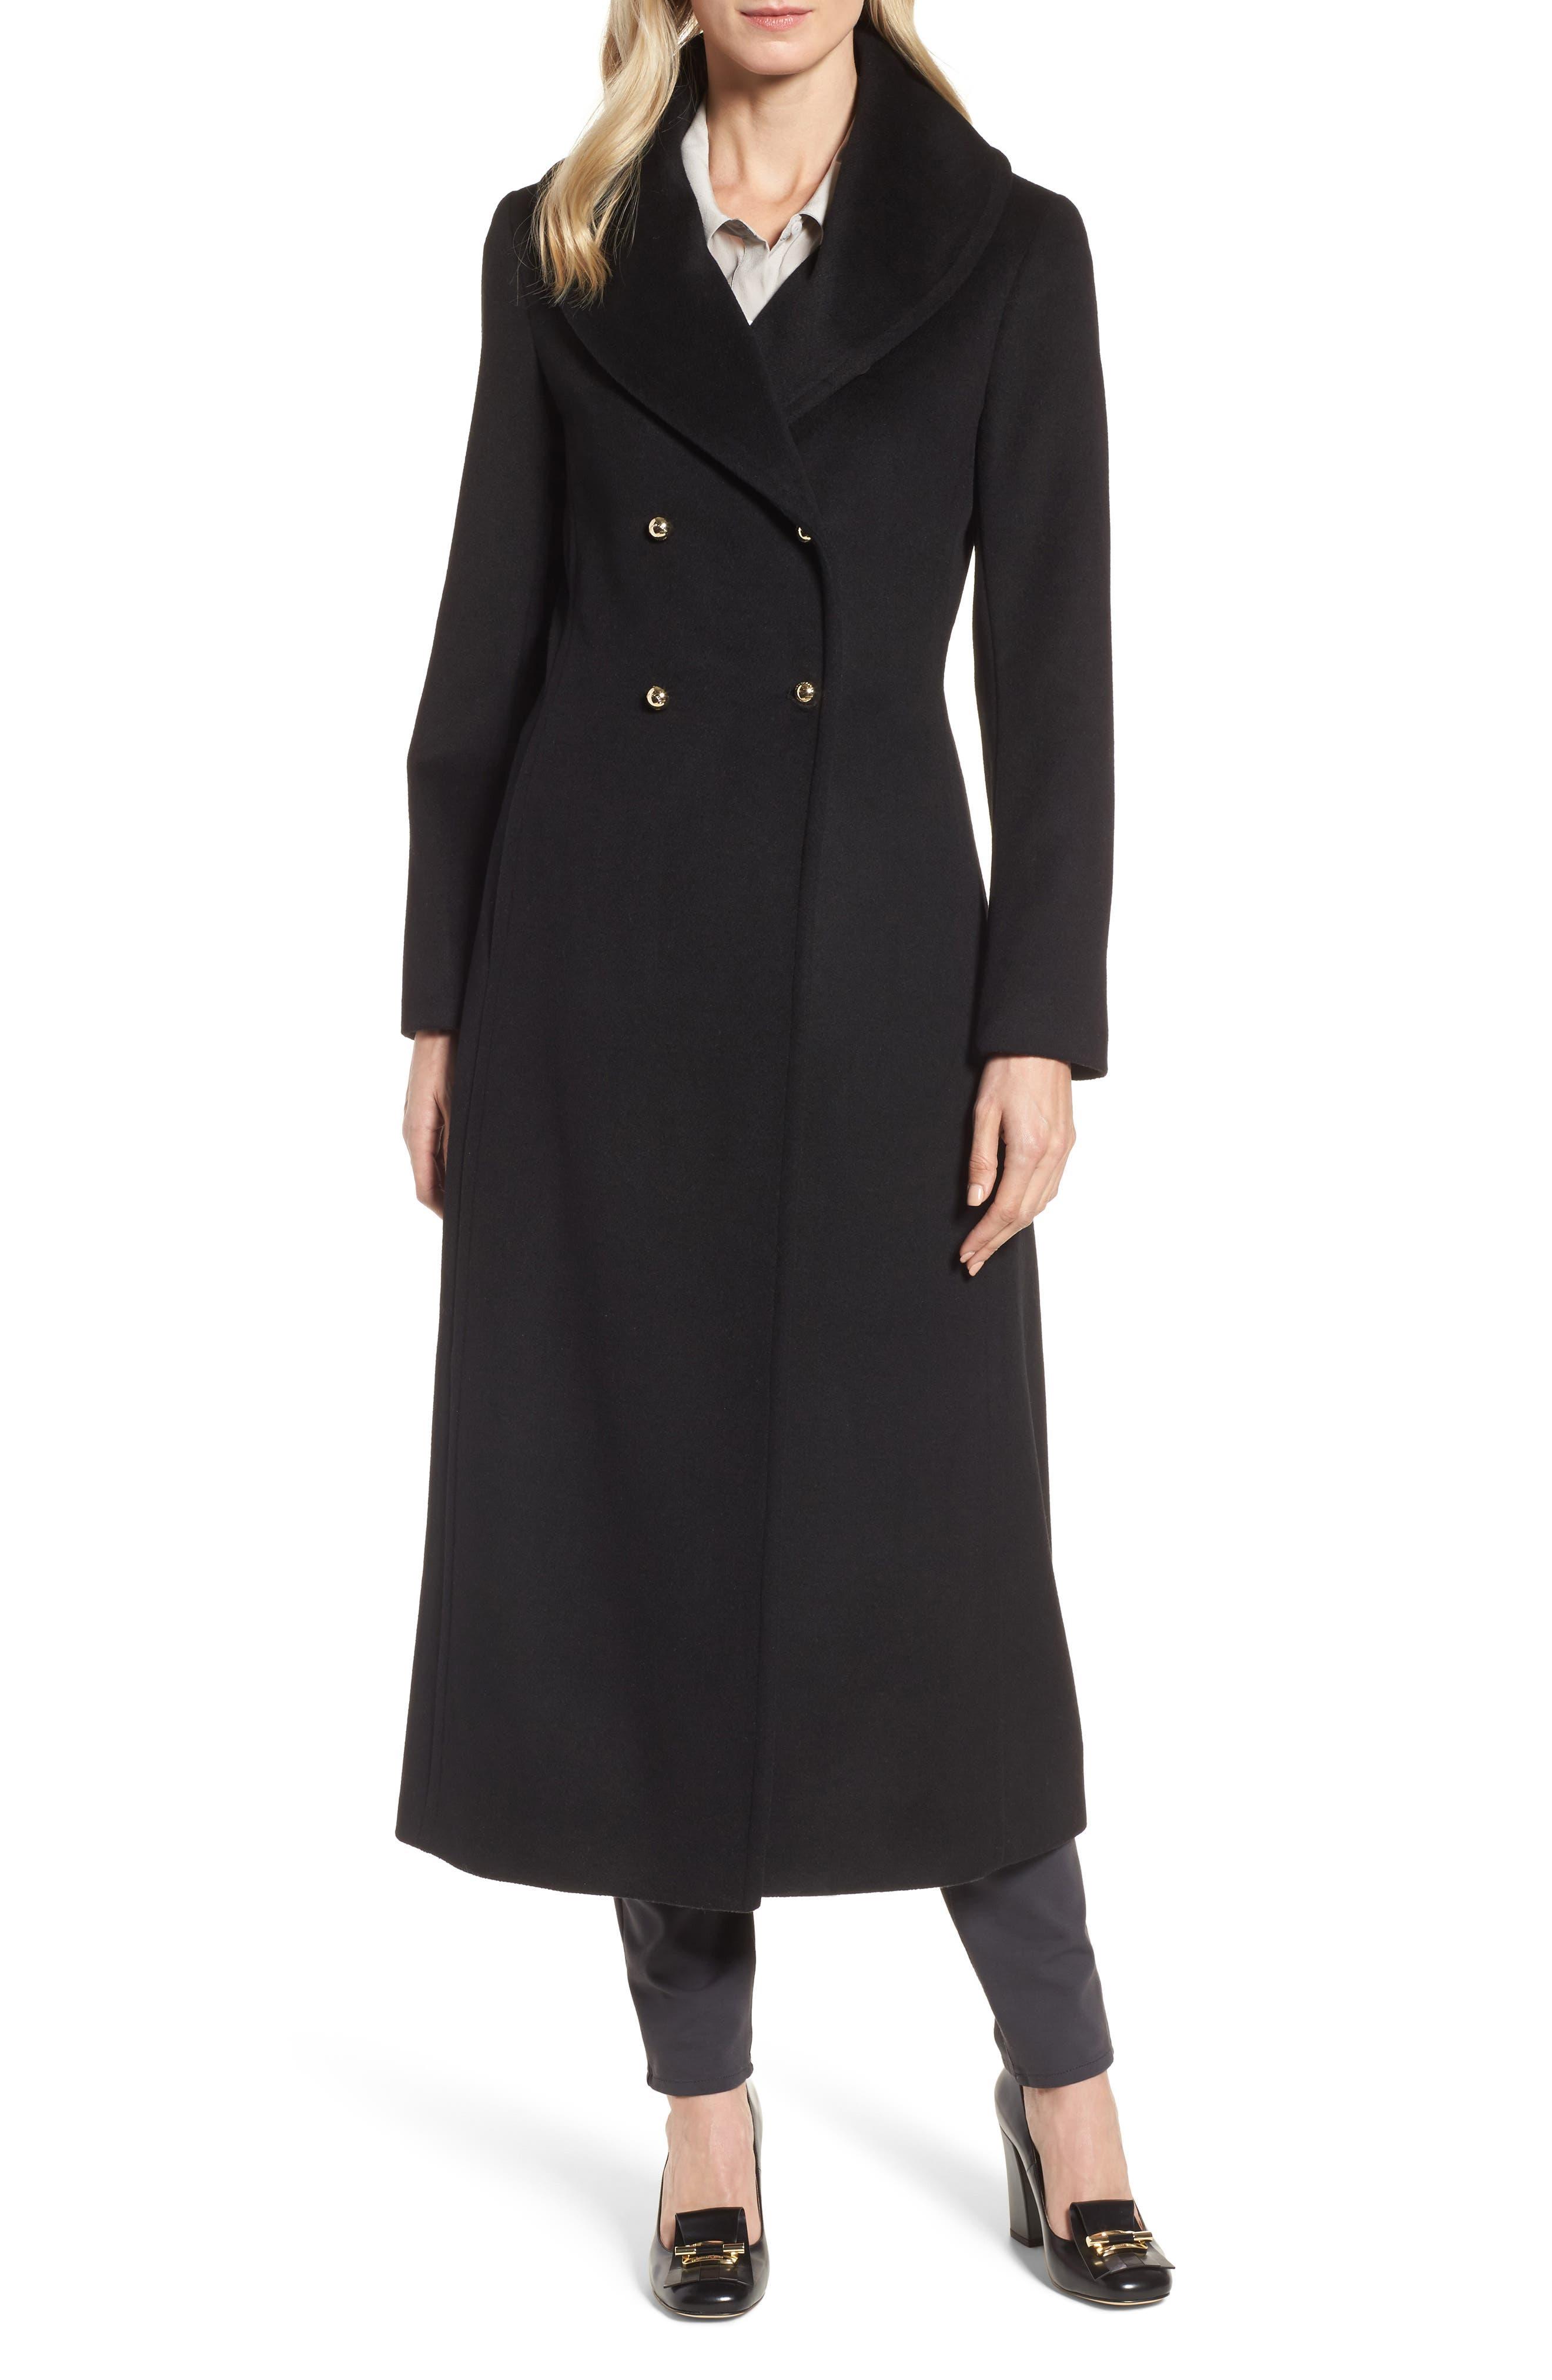 DKNY Wool Blend Felt Shawl Collar Coat